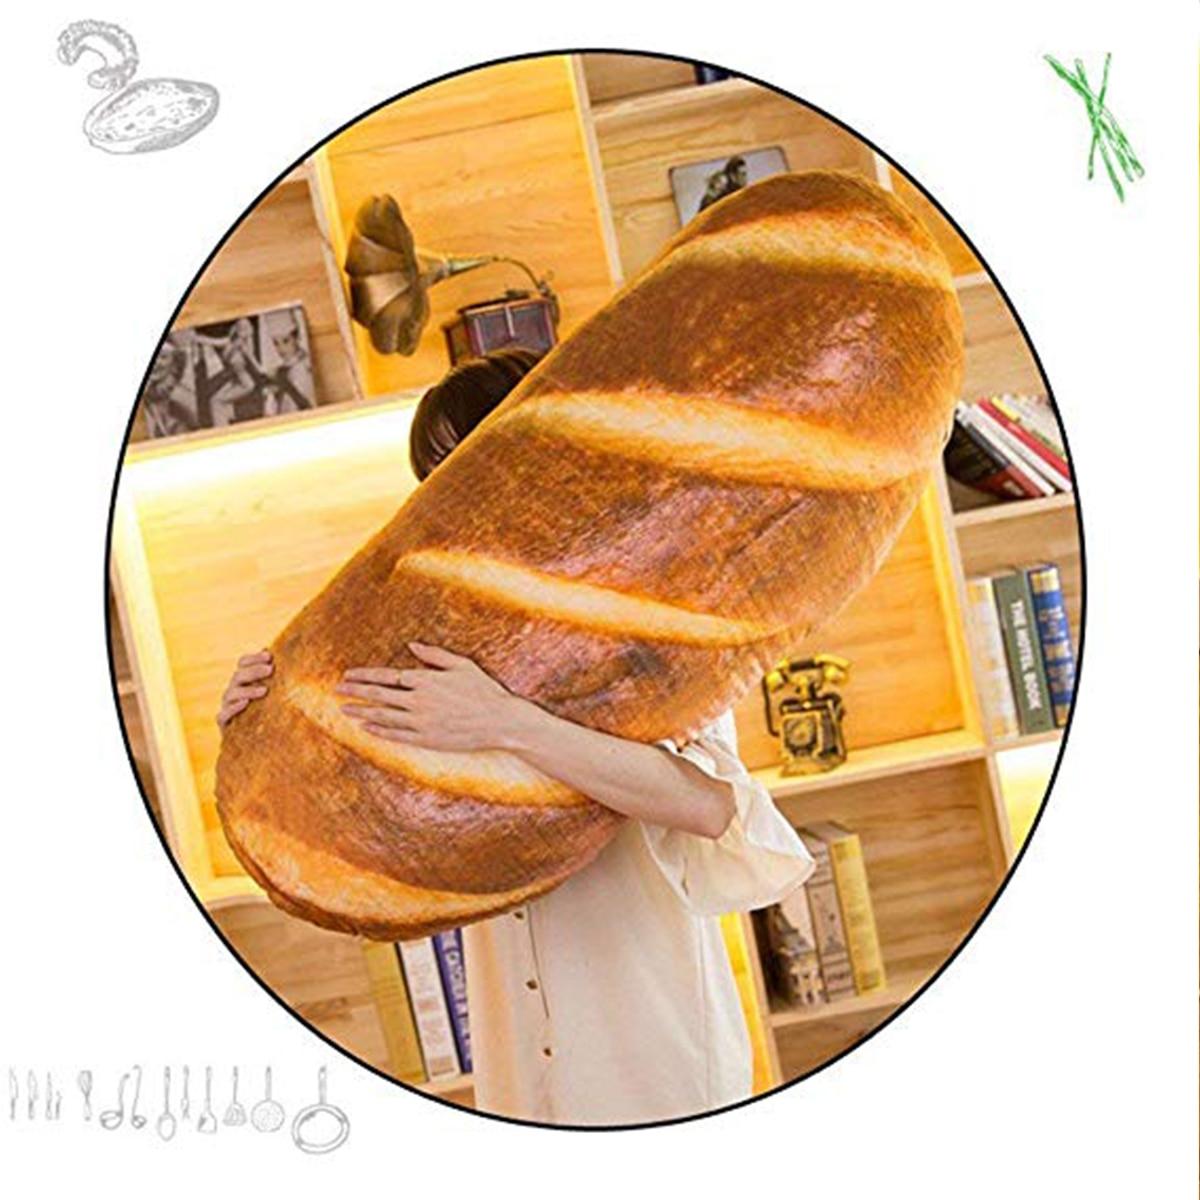 Bread Pillow 3